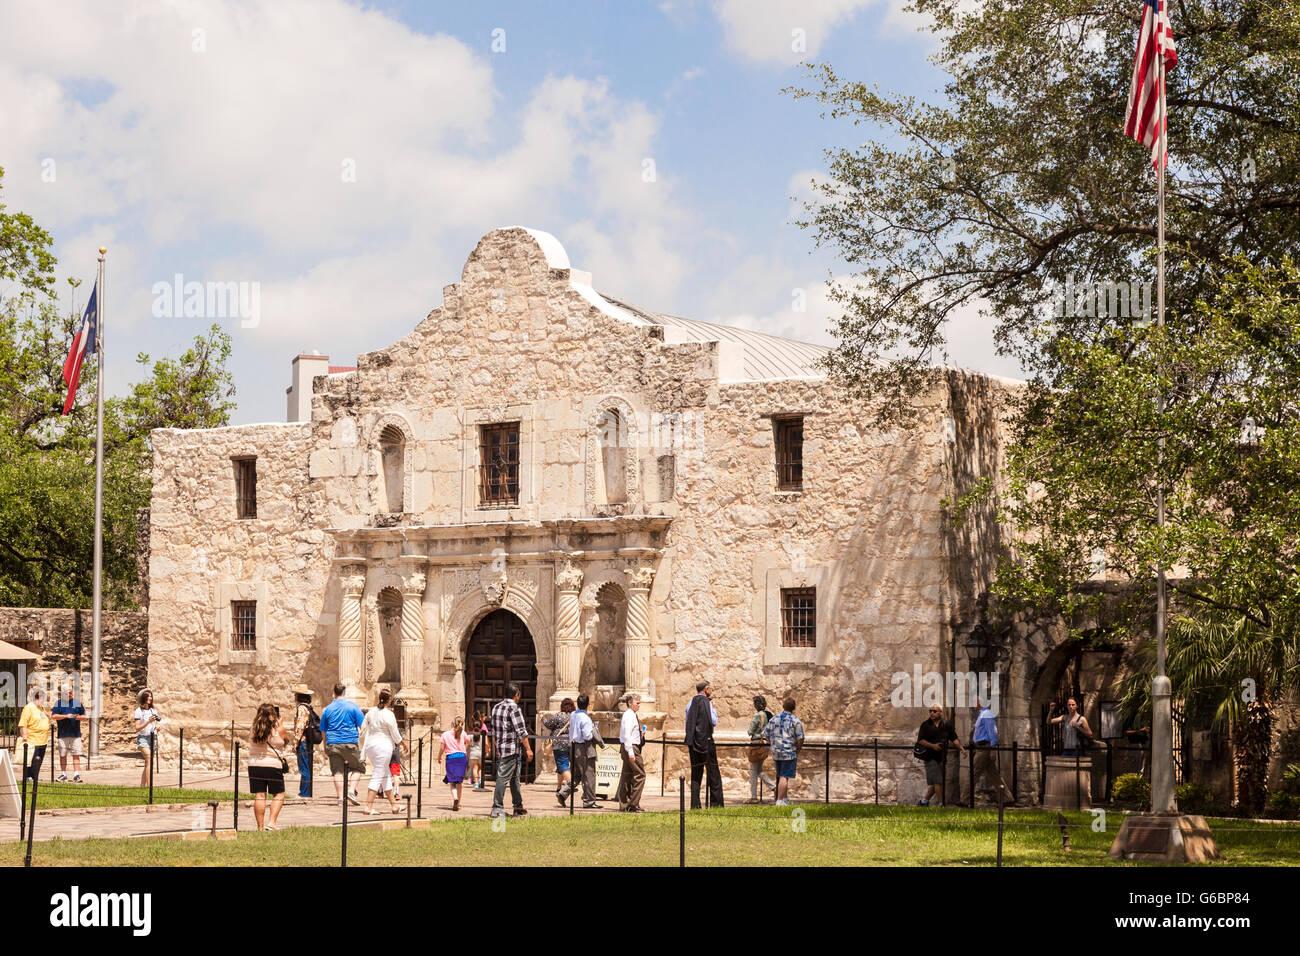 The Alamo Mission in San Antonio, Texas - Stock Image